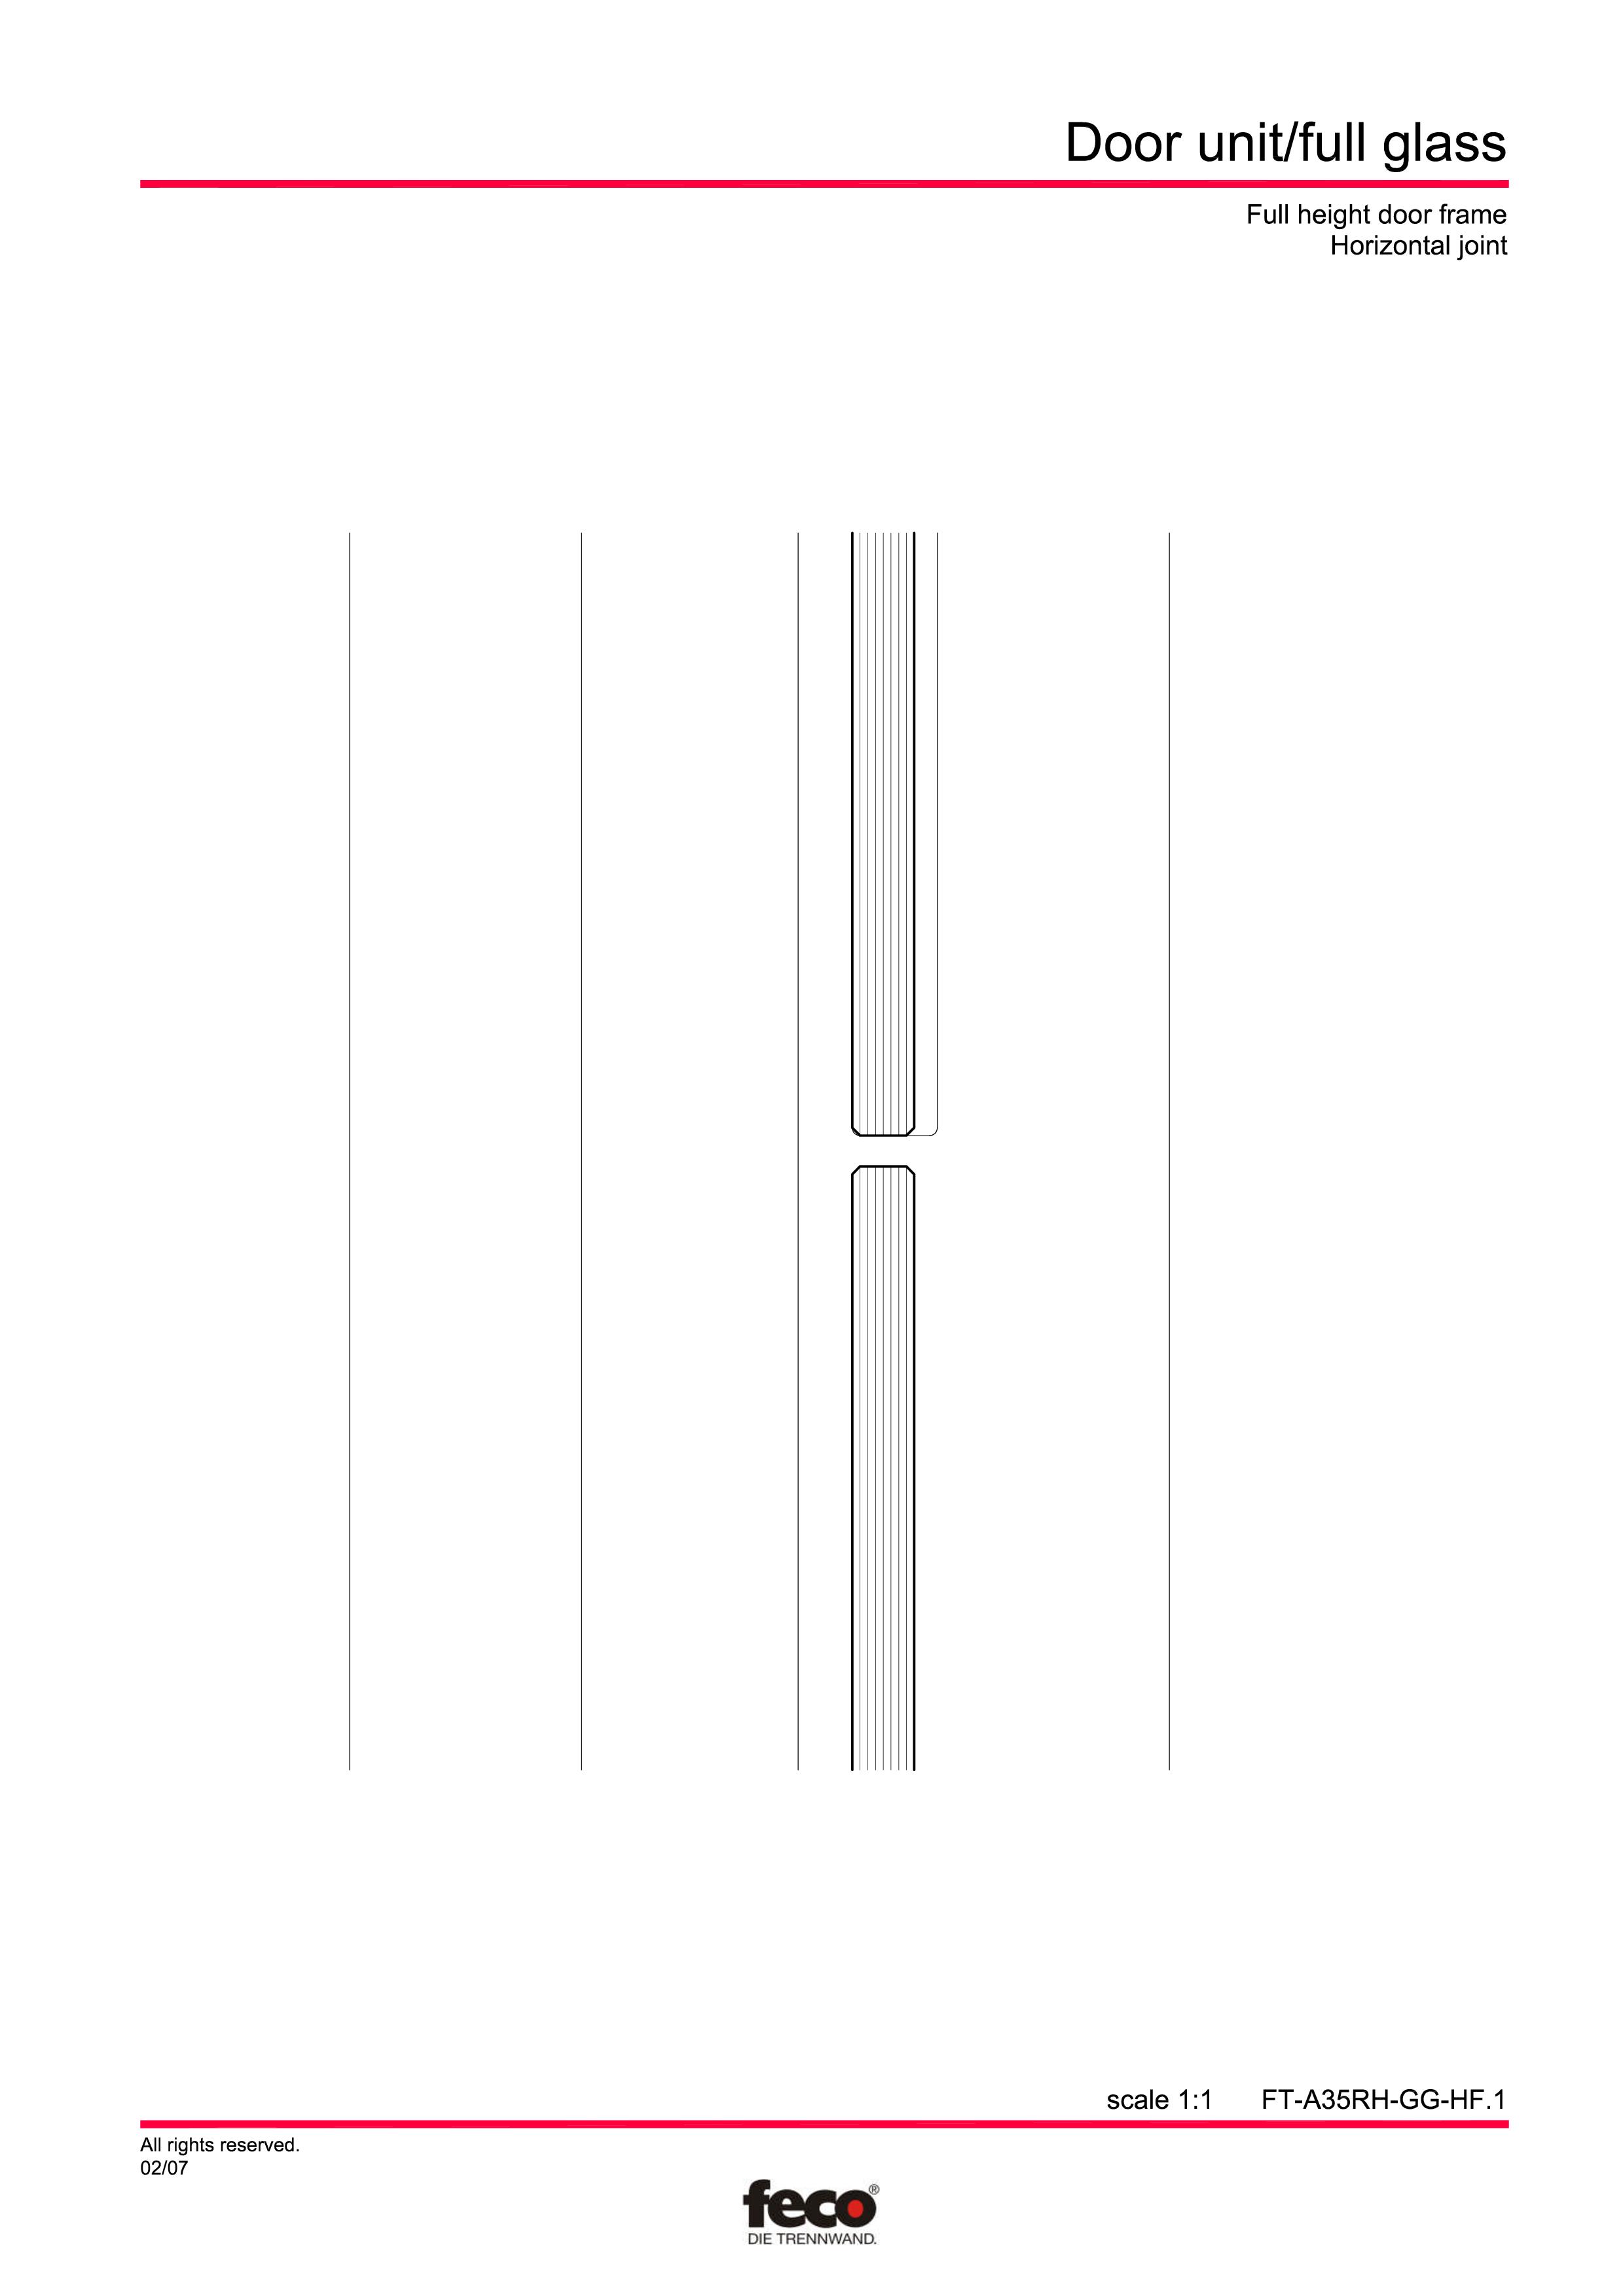 Pagina 3 - CAD-PDF Usa de sticla (pana la planseu) FECO Detaliu de montaj